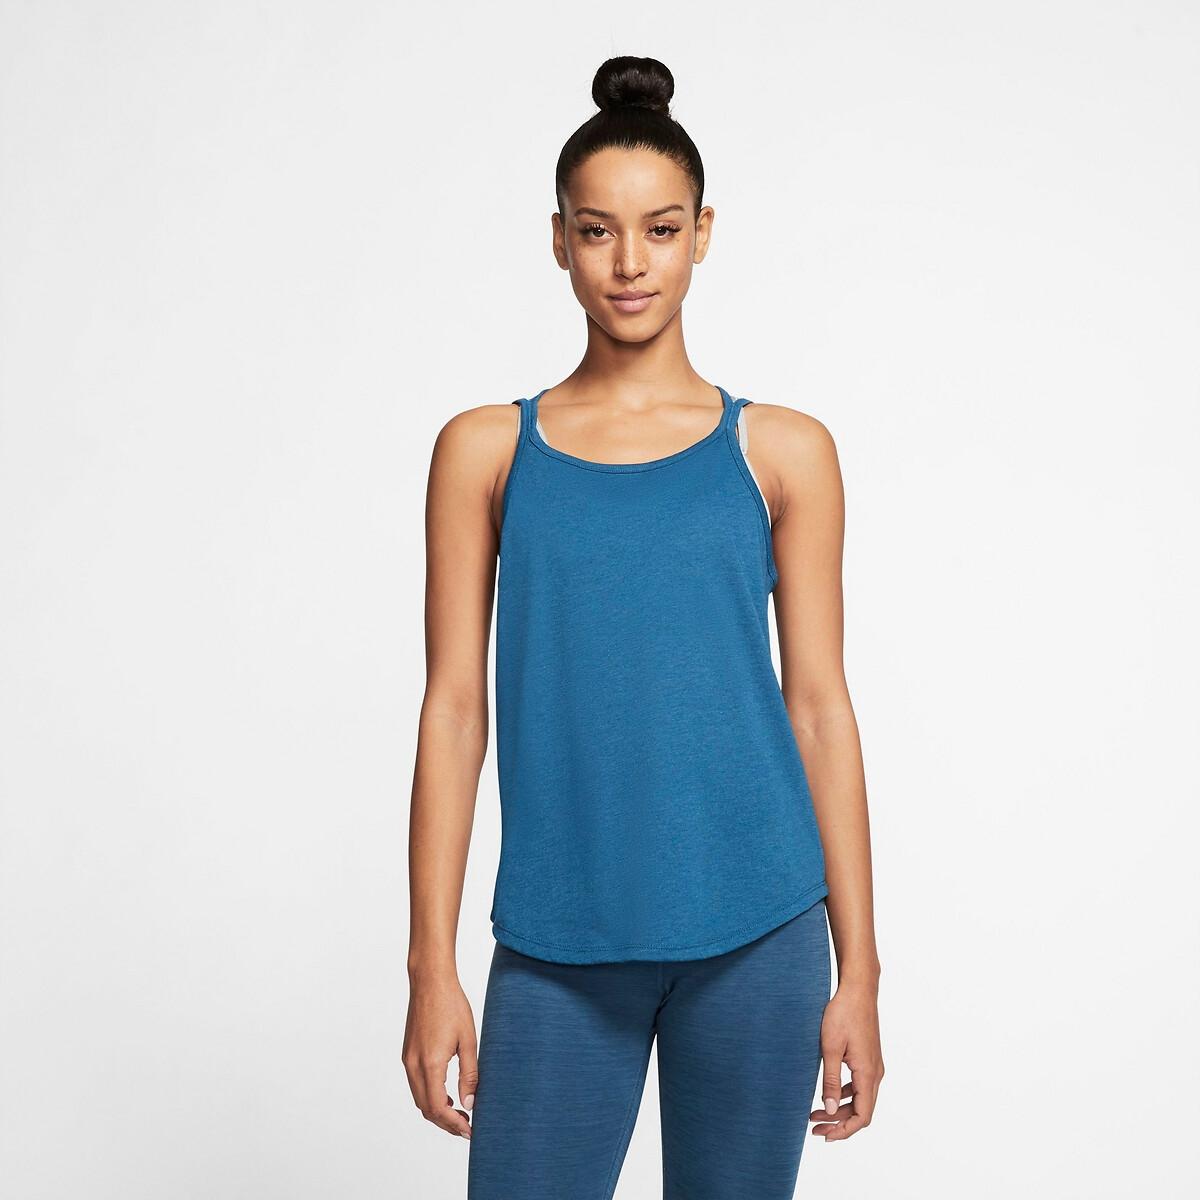 Camiseta de tirantes finos Yoga